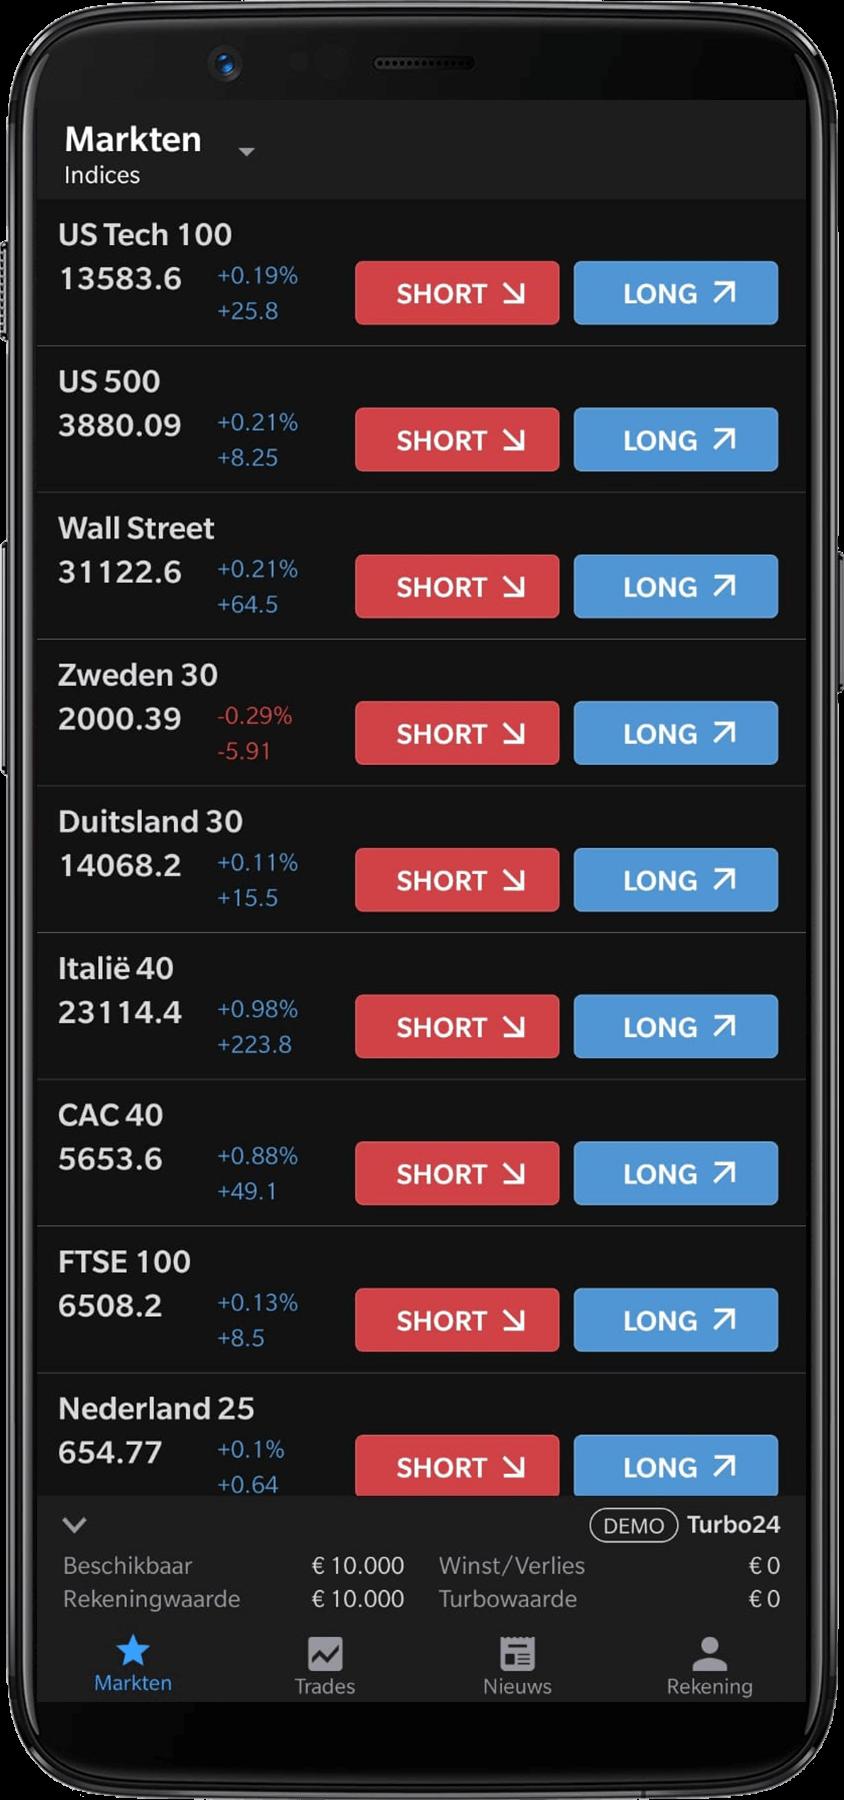 IG markten